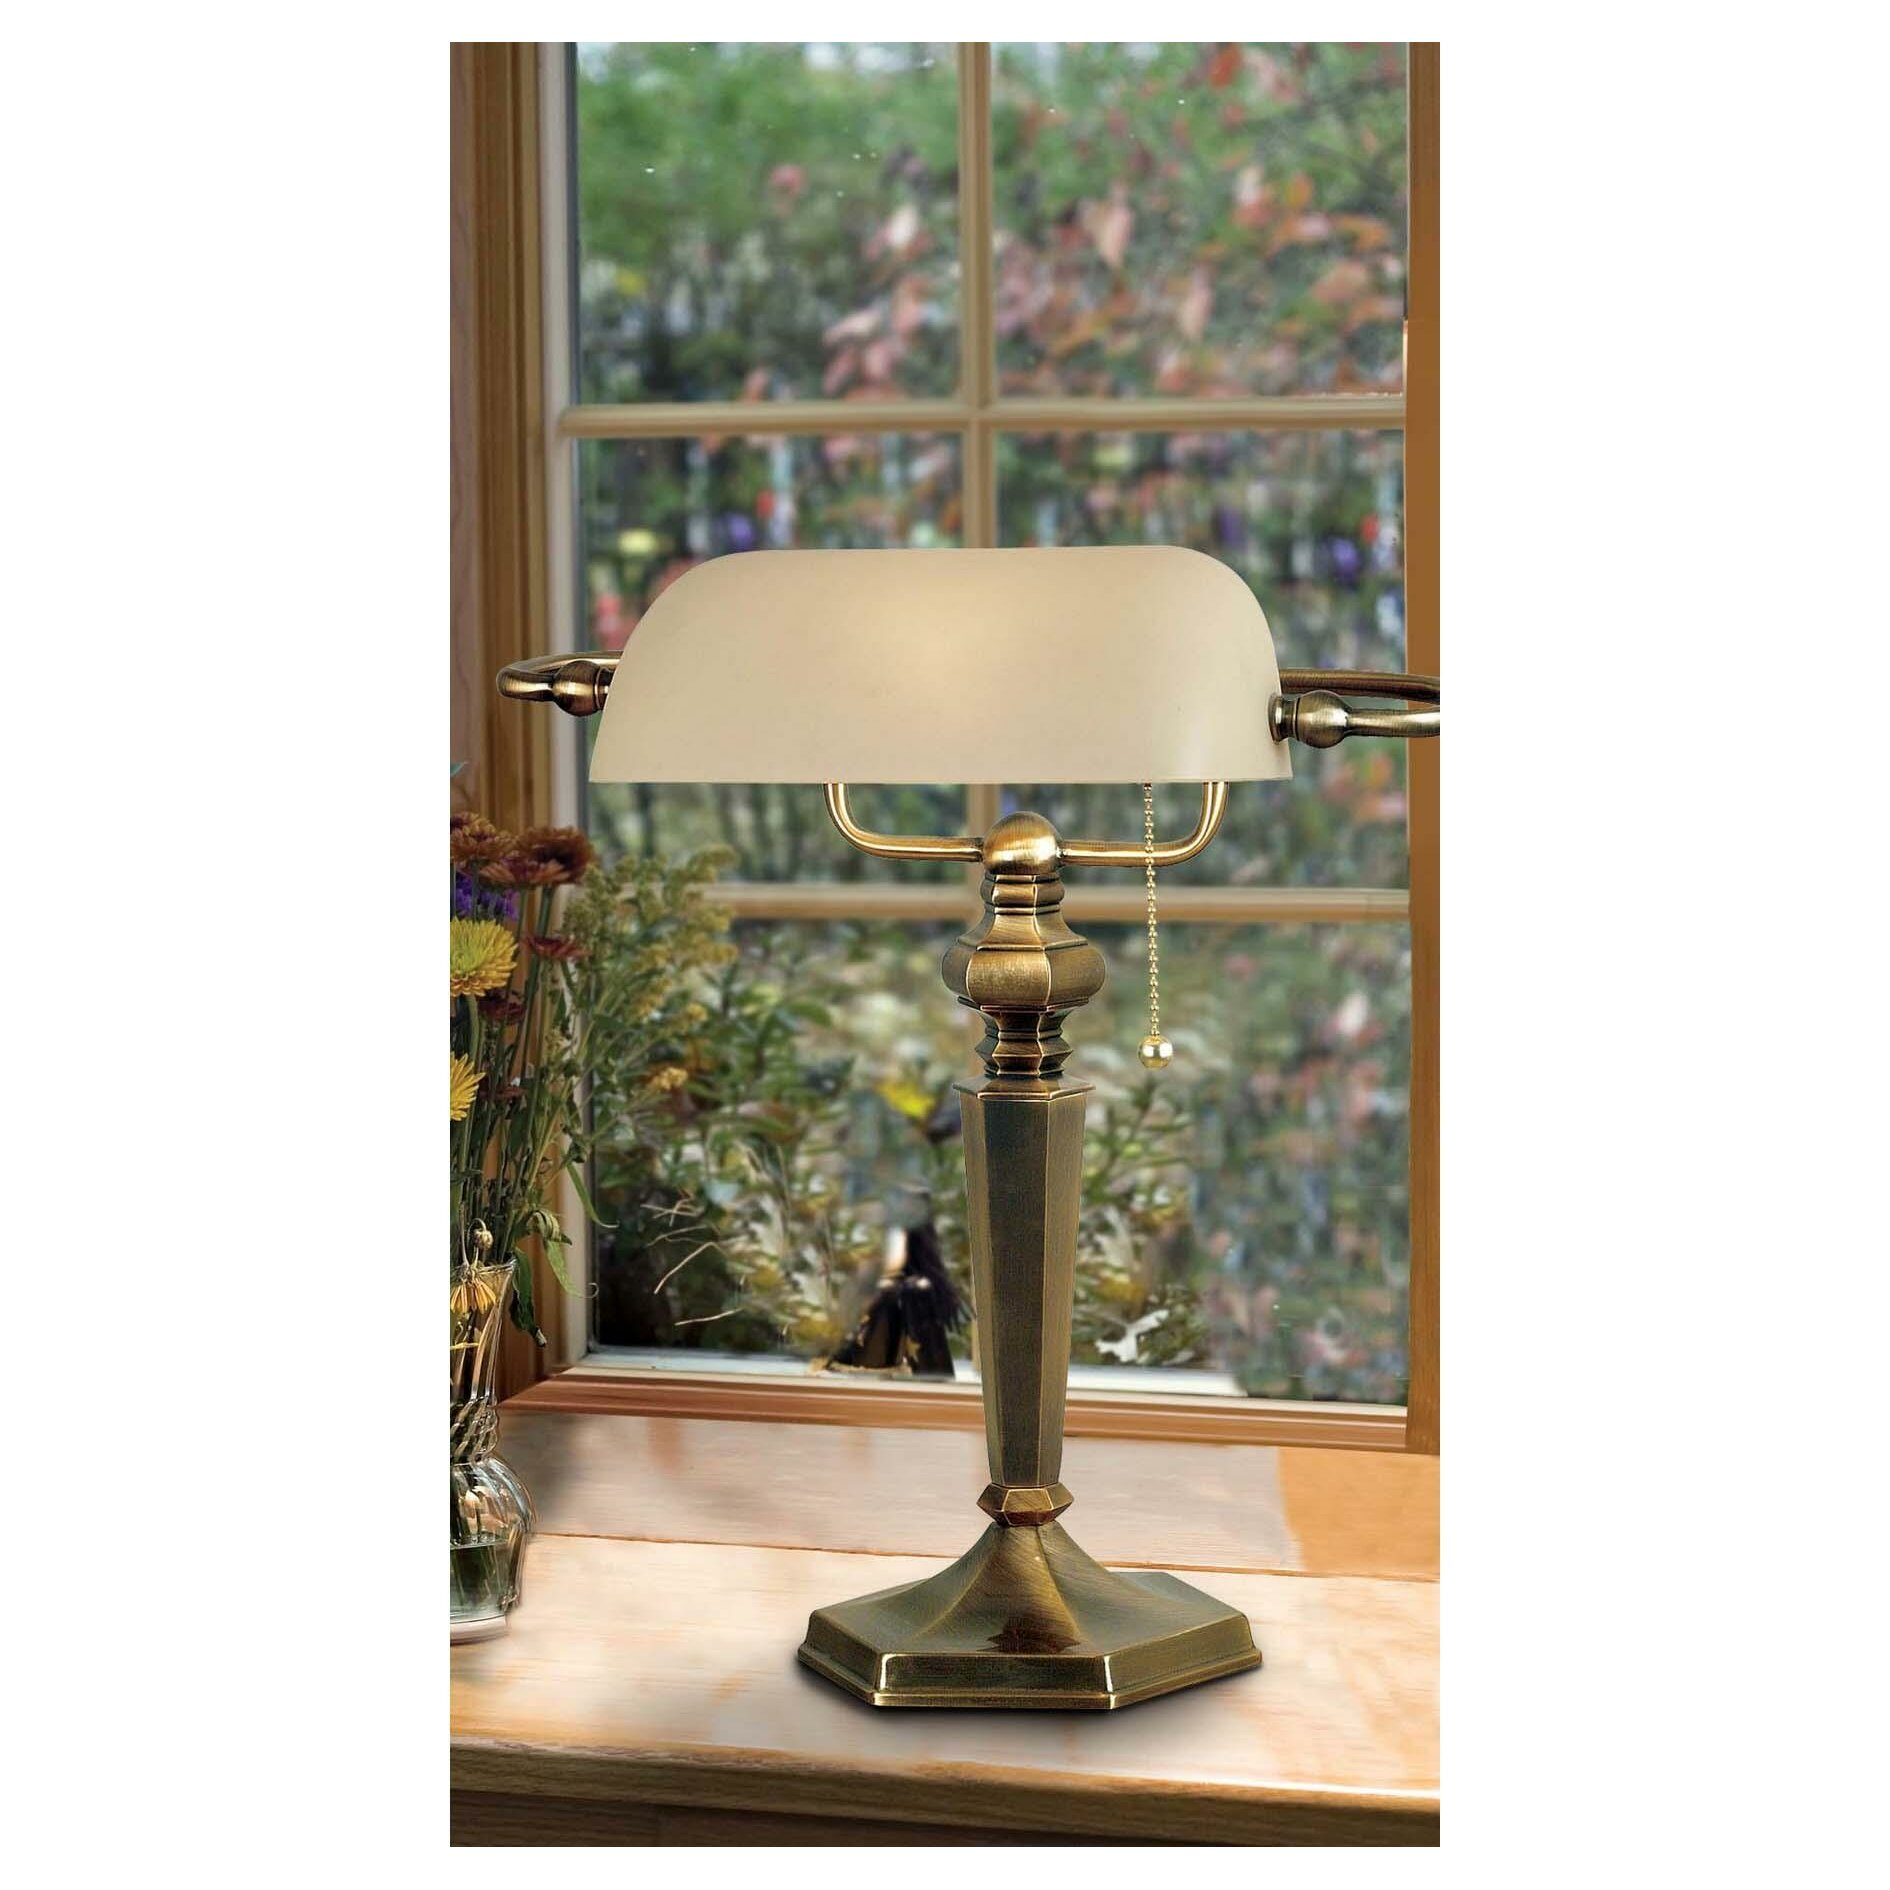 Wildon Home 174 Mackinley Banker 15quot Table Lamp amp Reviews  : AltonBankersTableLampinGeorgetownBronze from www.wayfair.com size 1890 x 1890 jpeg 374kB